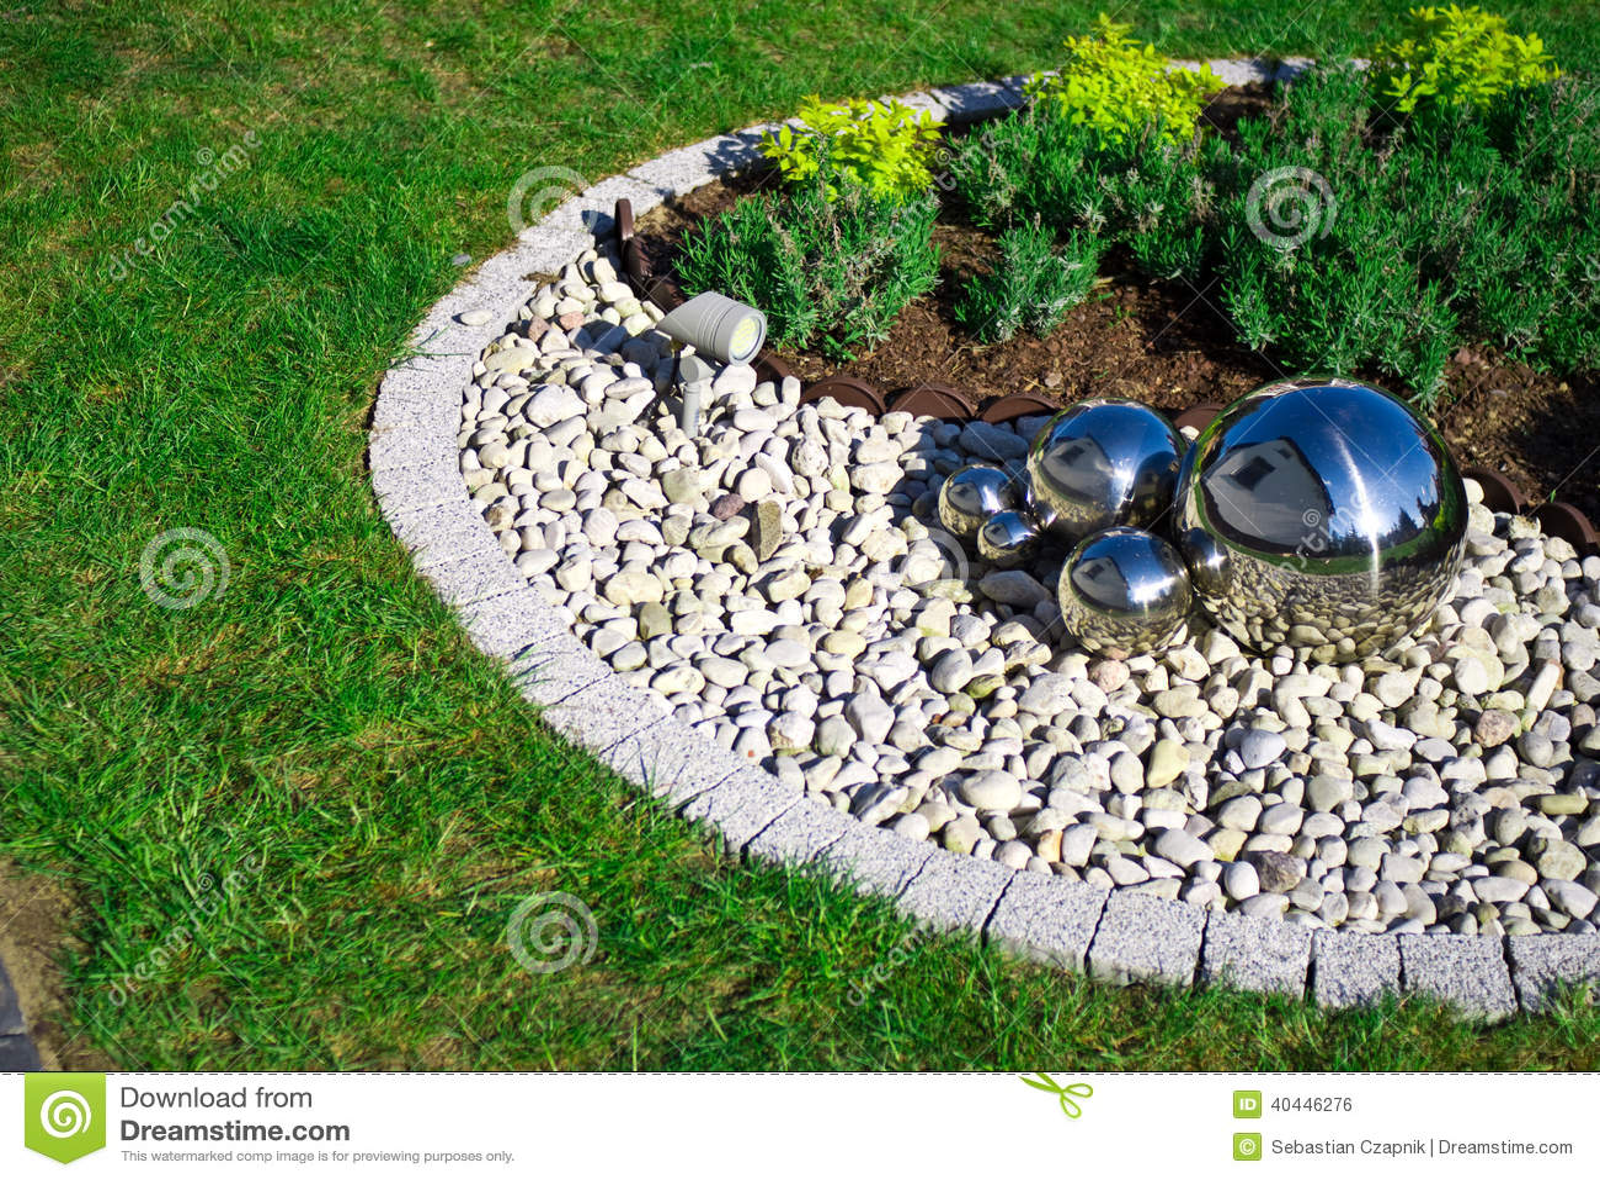 Garden Decoration With Silver Mirror Spheres Stock Photo